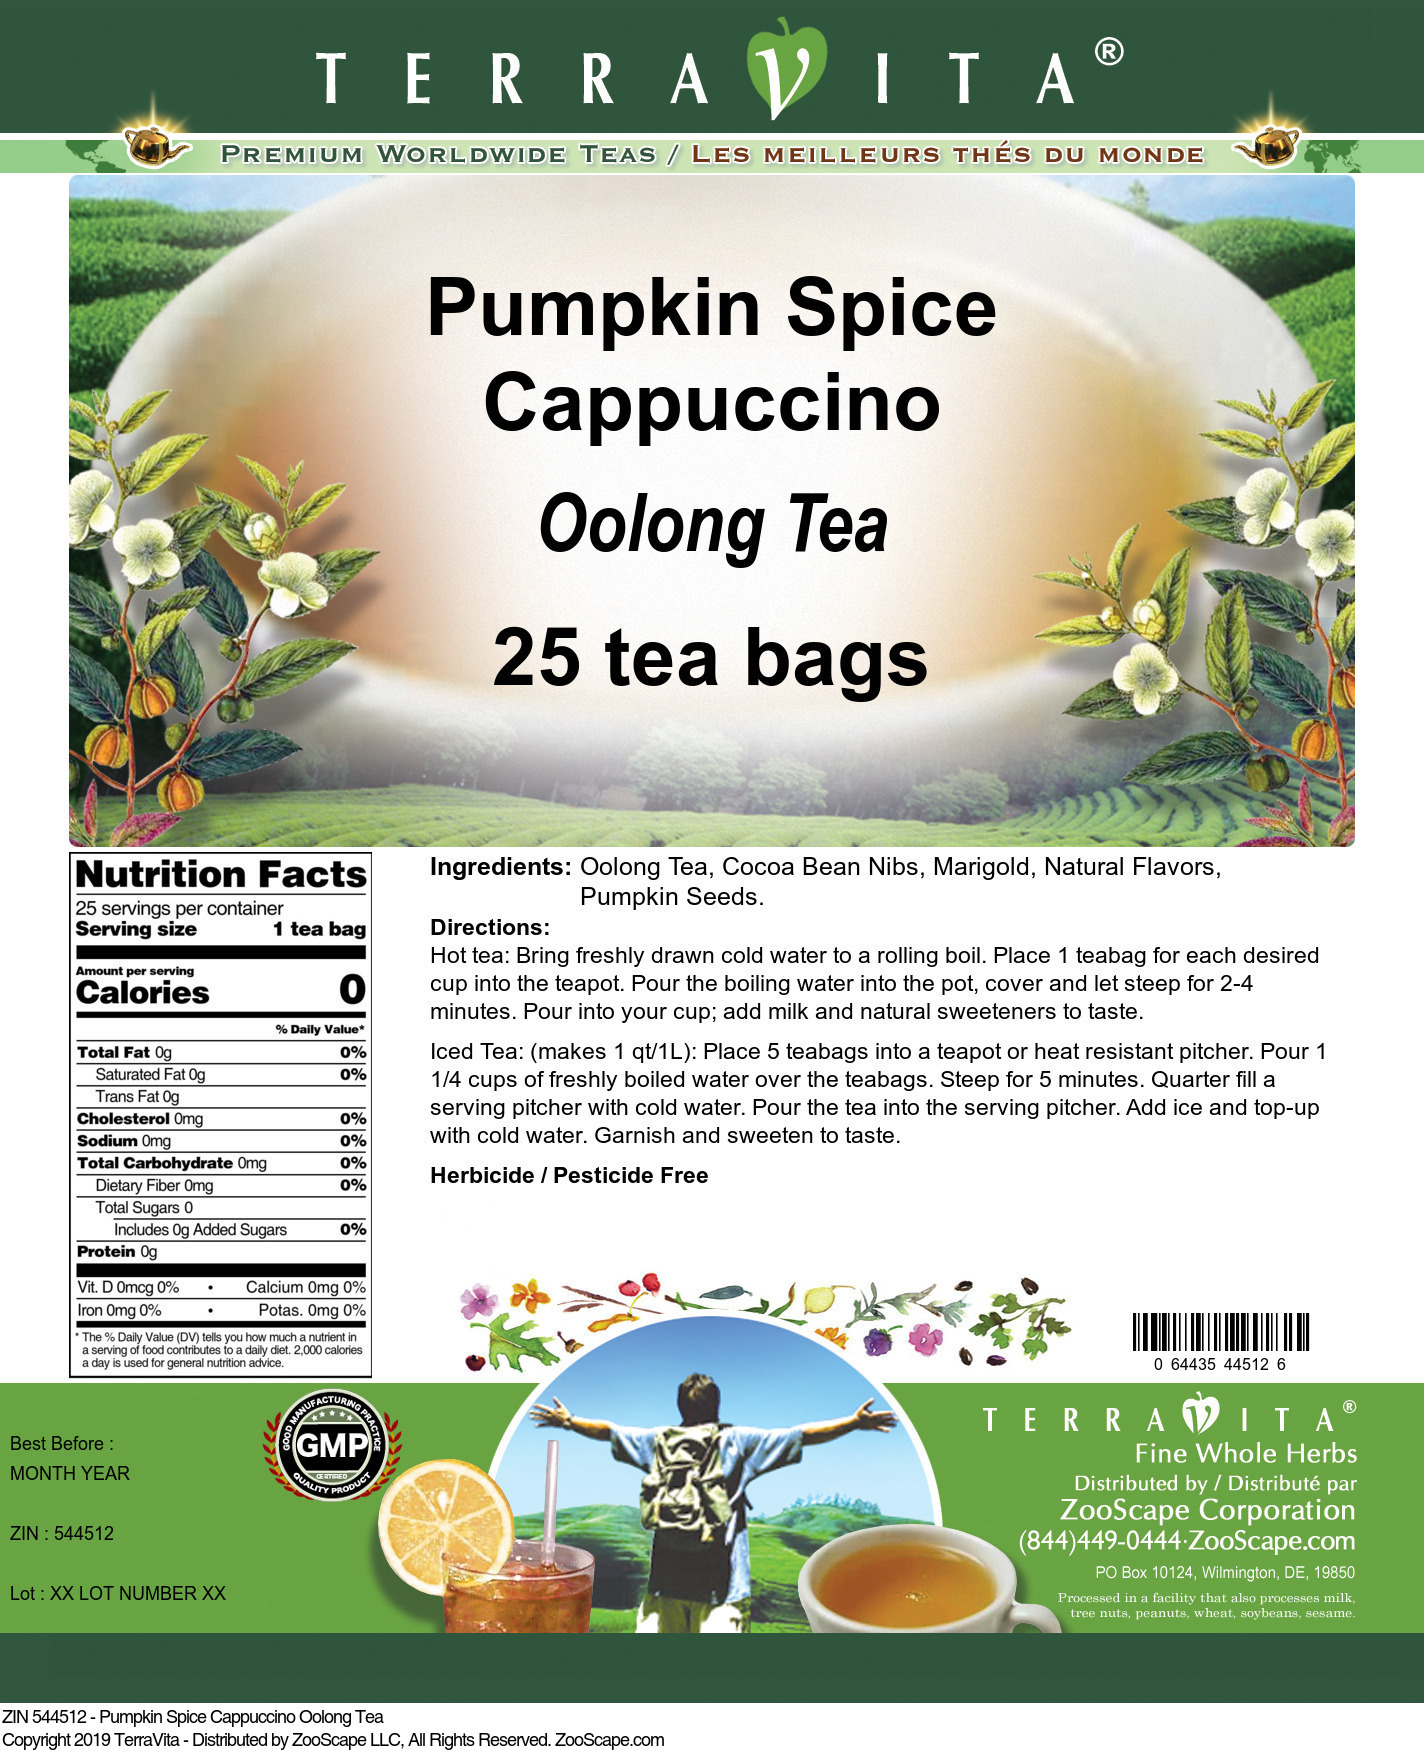 Pumpkin Spice Cappuccino Oolong Tea